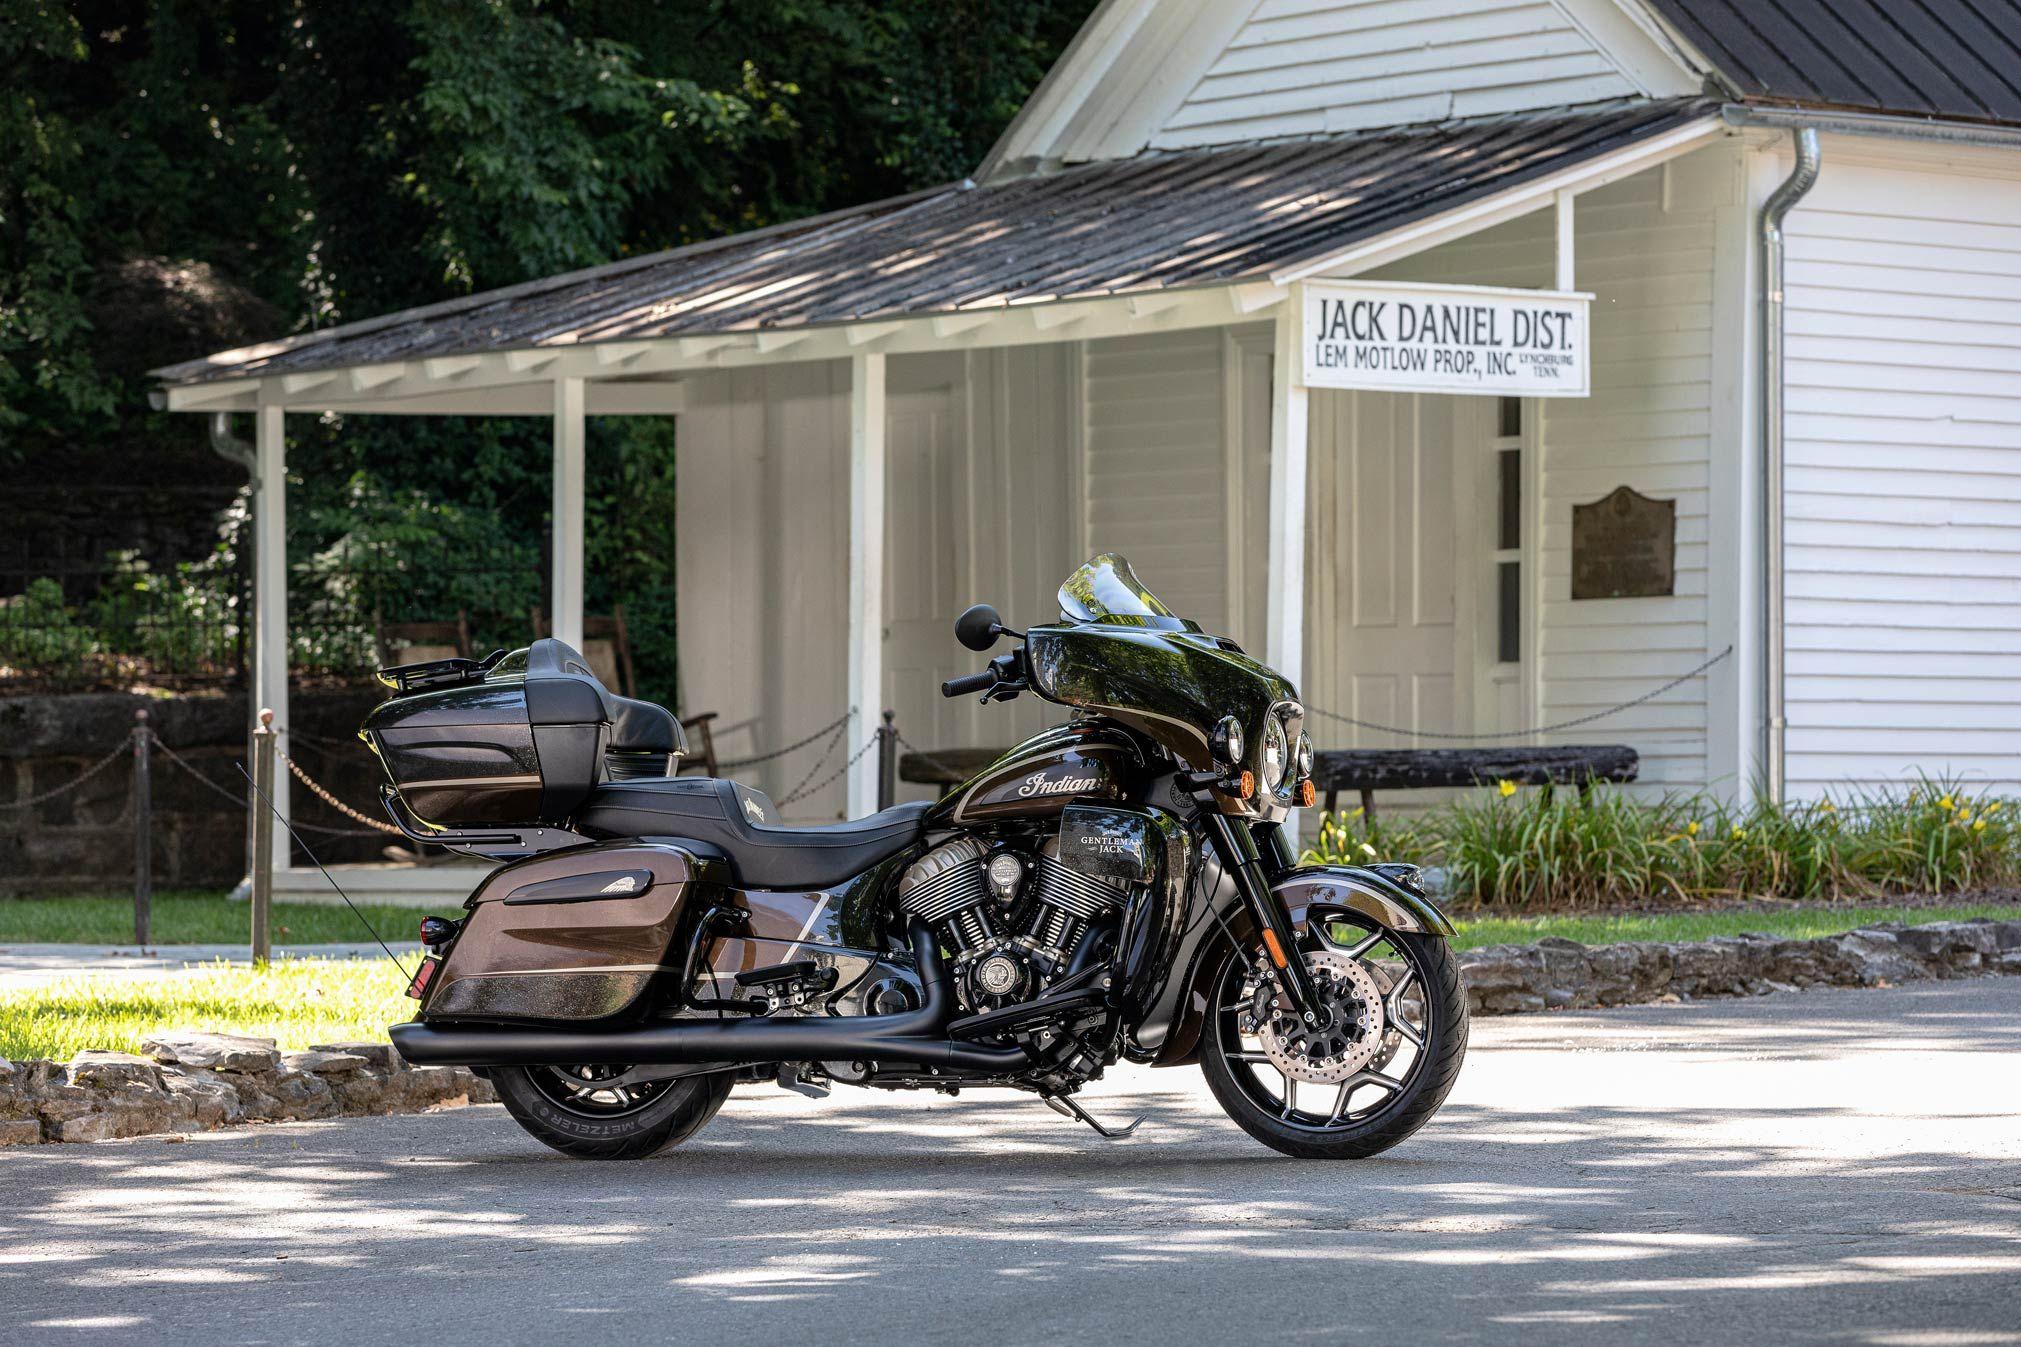 2021motorcyclemodels Motorcycle News 2021 Australia 2021 Indian Roadmaster Dark Horse Jack Daniel S Guide 2021 I Jack Daniels Dark Horse Motorcycle Model [ 1347 x 2021 Pixel ]